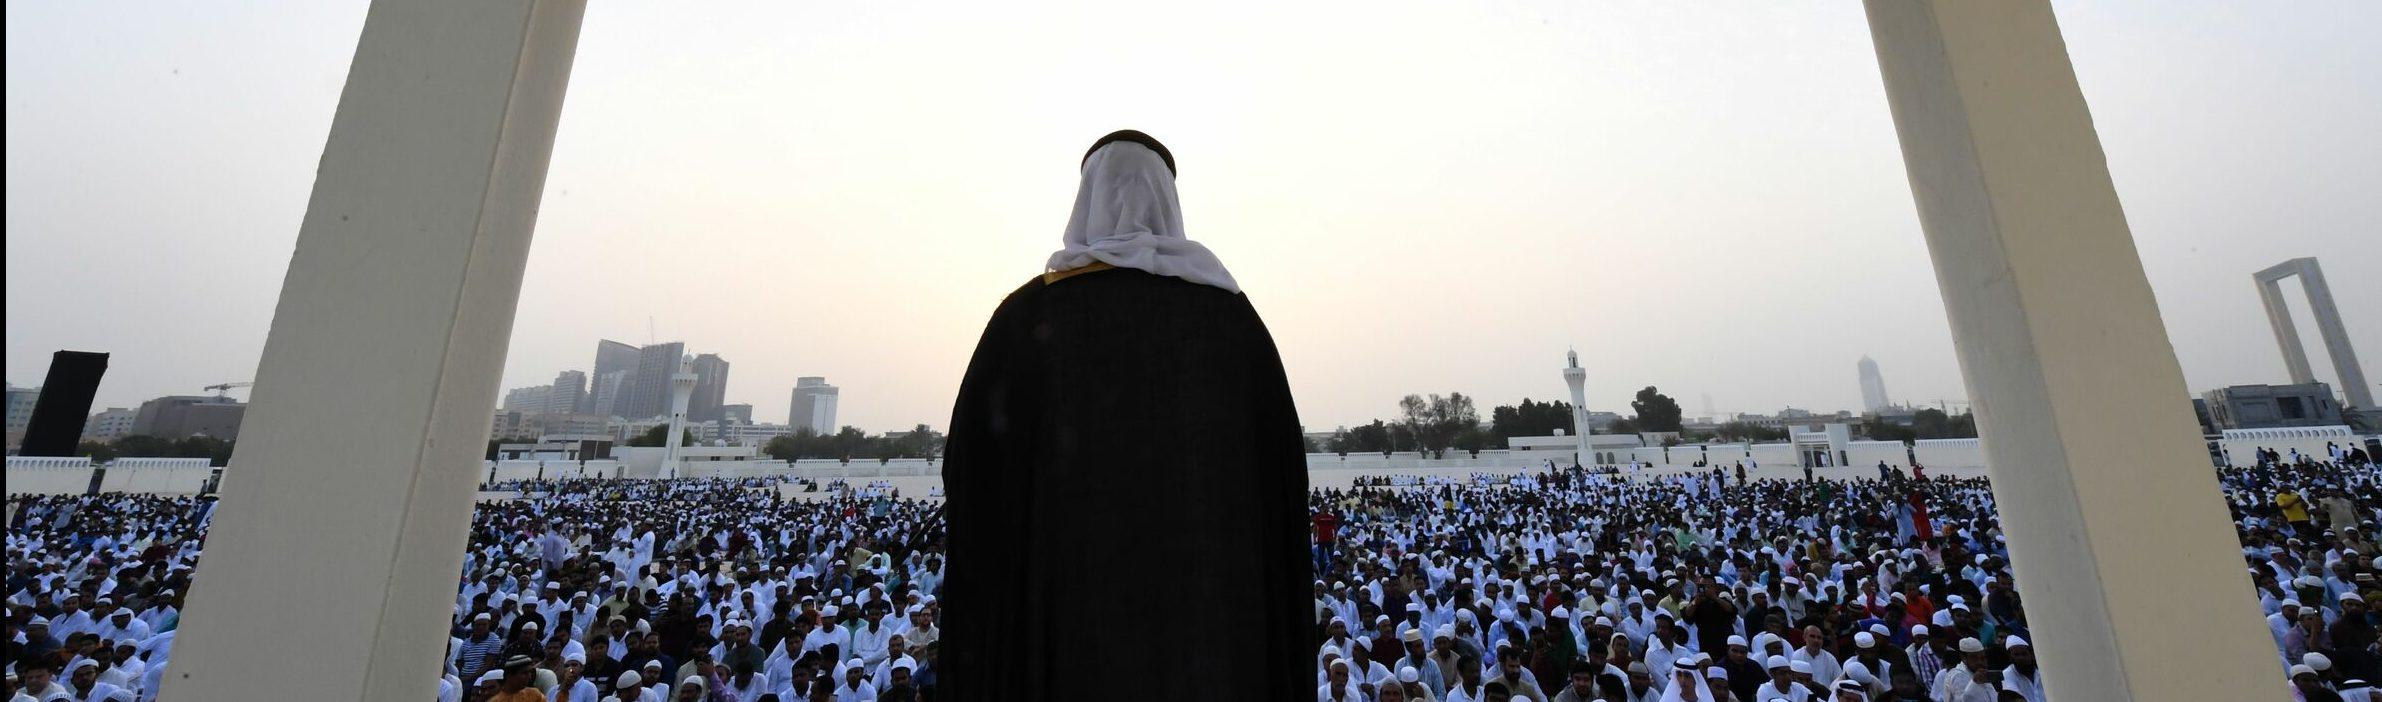 https://it.insideover.com/wp-content/uploads/2019/08/Imam-negli-Emirati-Arabi-Uniti-La-Presse-e1567261765489.jpg